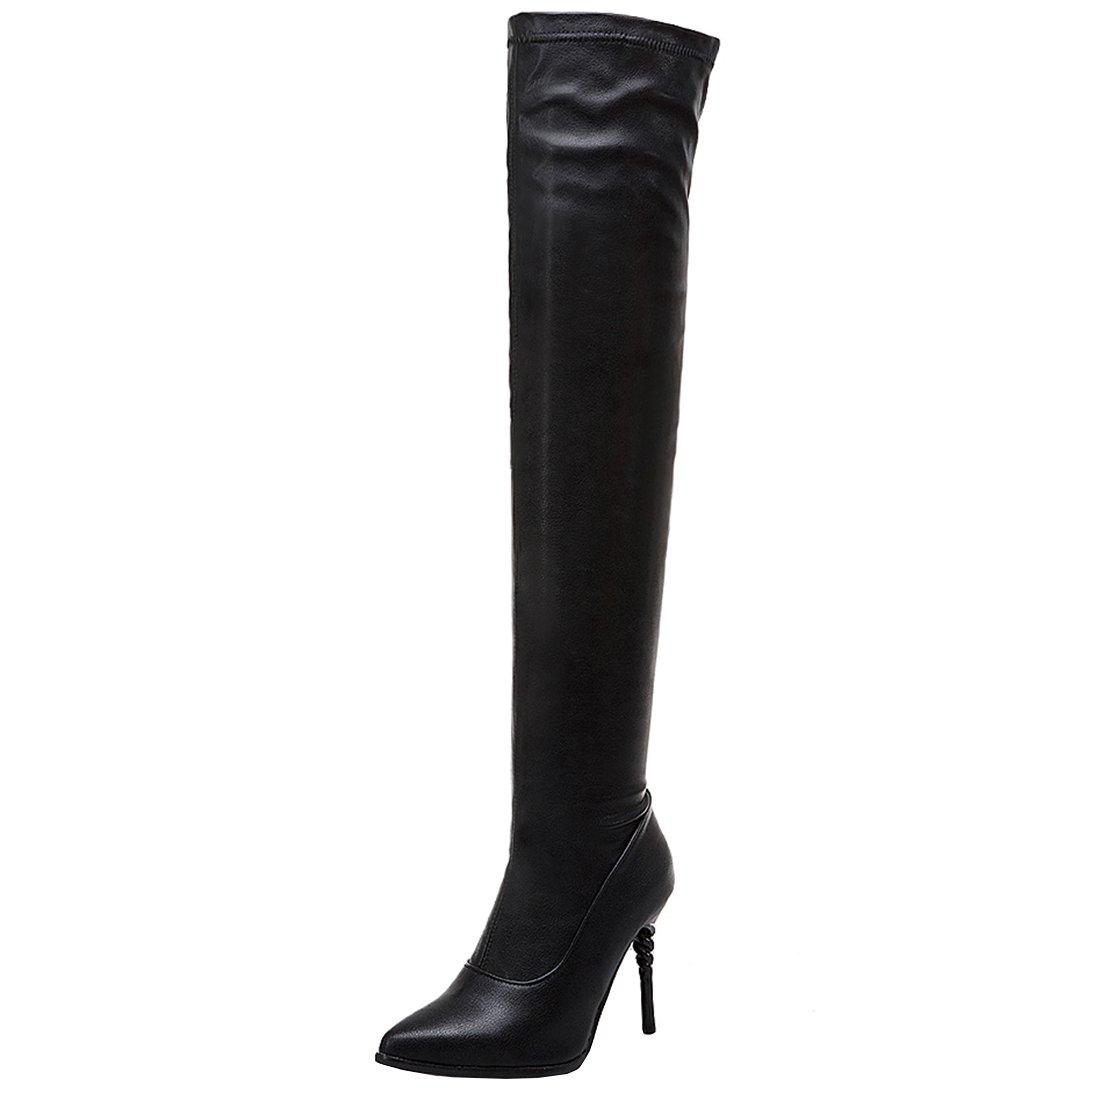 YE Chaussure Bottes B01C5O9CUM Cuissardes Extensibles Stretch Femme Sexy Longue YE Winter Talon Aiguille Bout Pointu Haute Winter Shoes Boots Chaude Hiver Noir 9a11438 - jessicalock.space